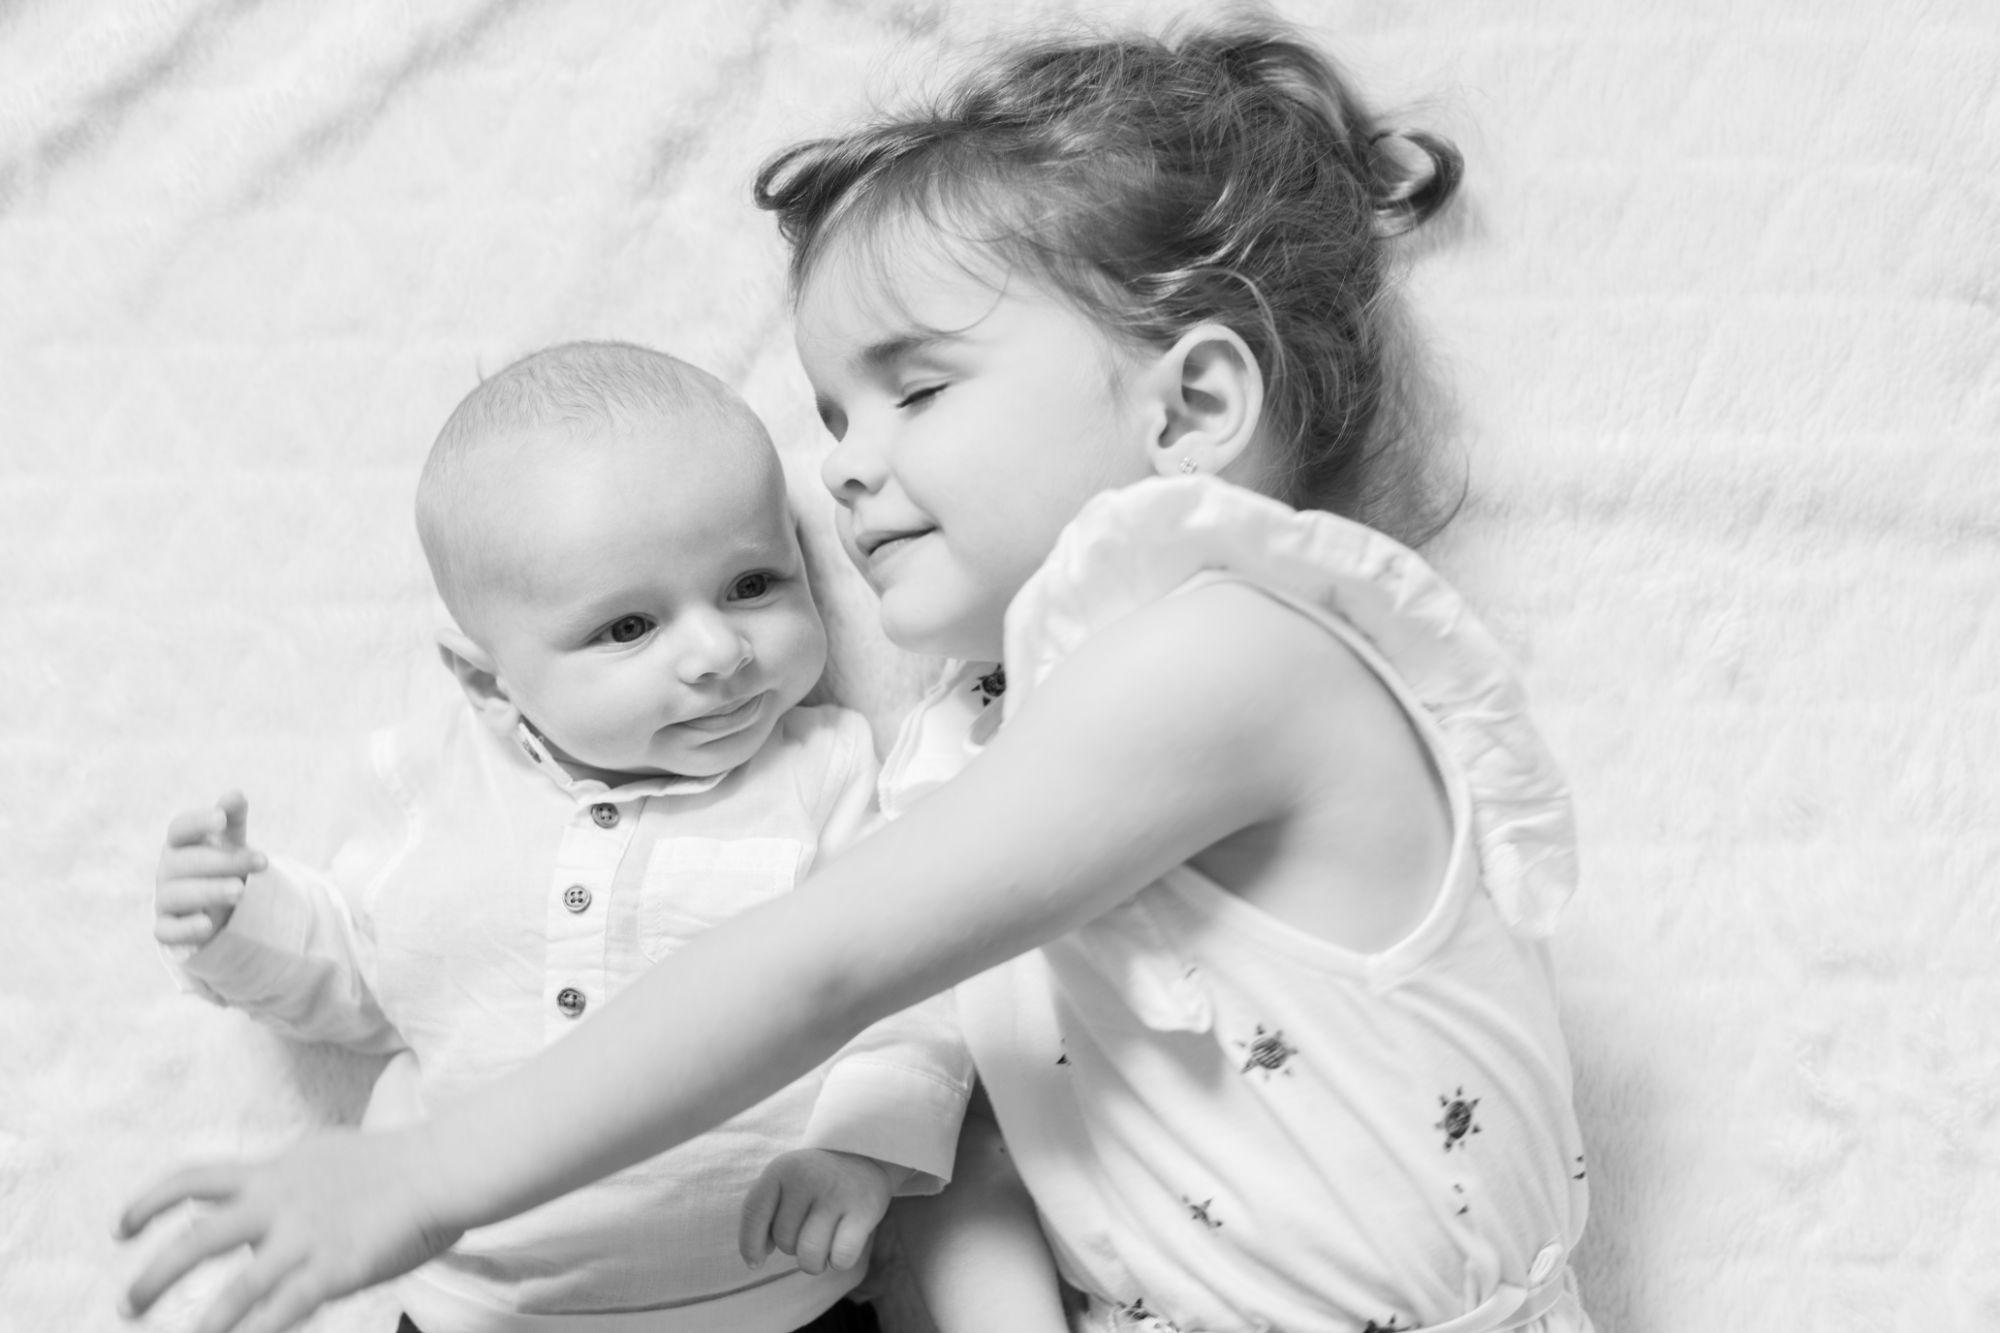 priscillapuzenat-photographe-portrait-famille-naissance-maternite-bebe-auxerre-yonne-bourgogne-france